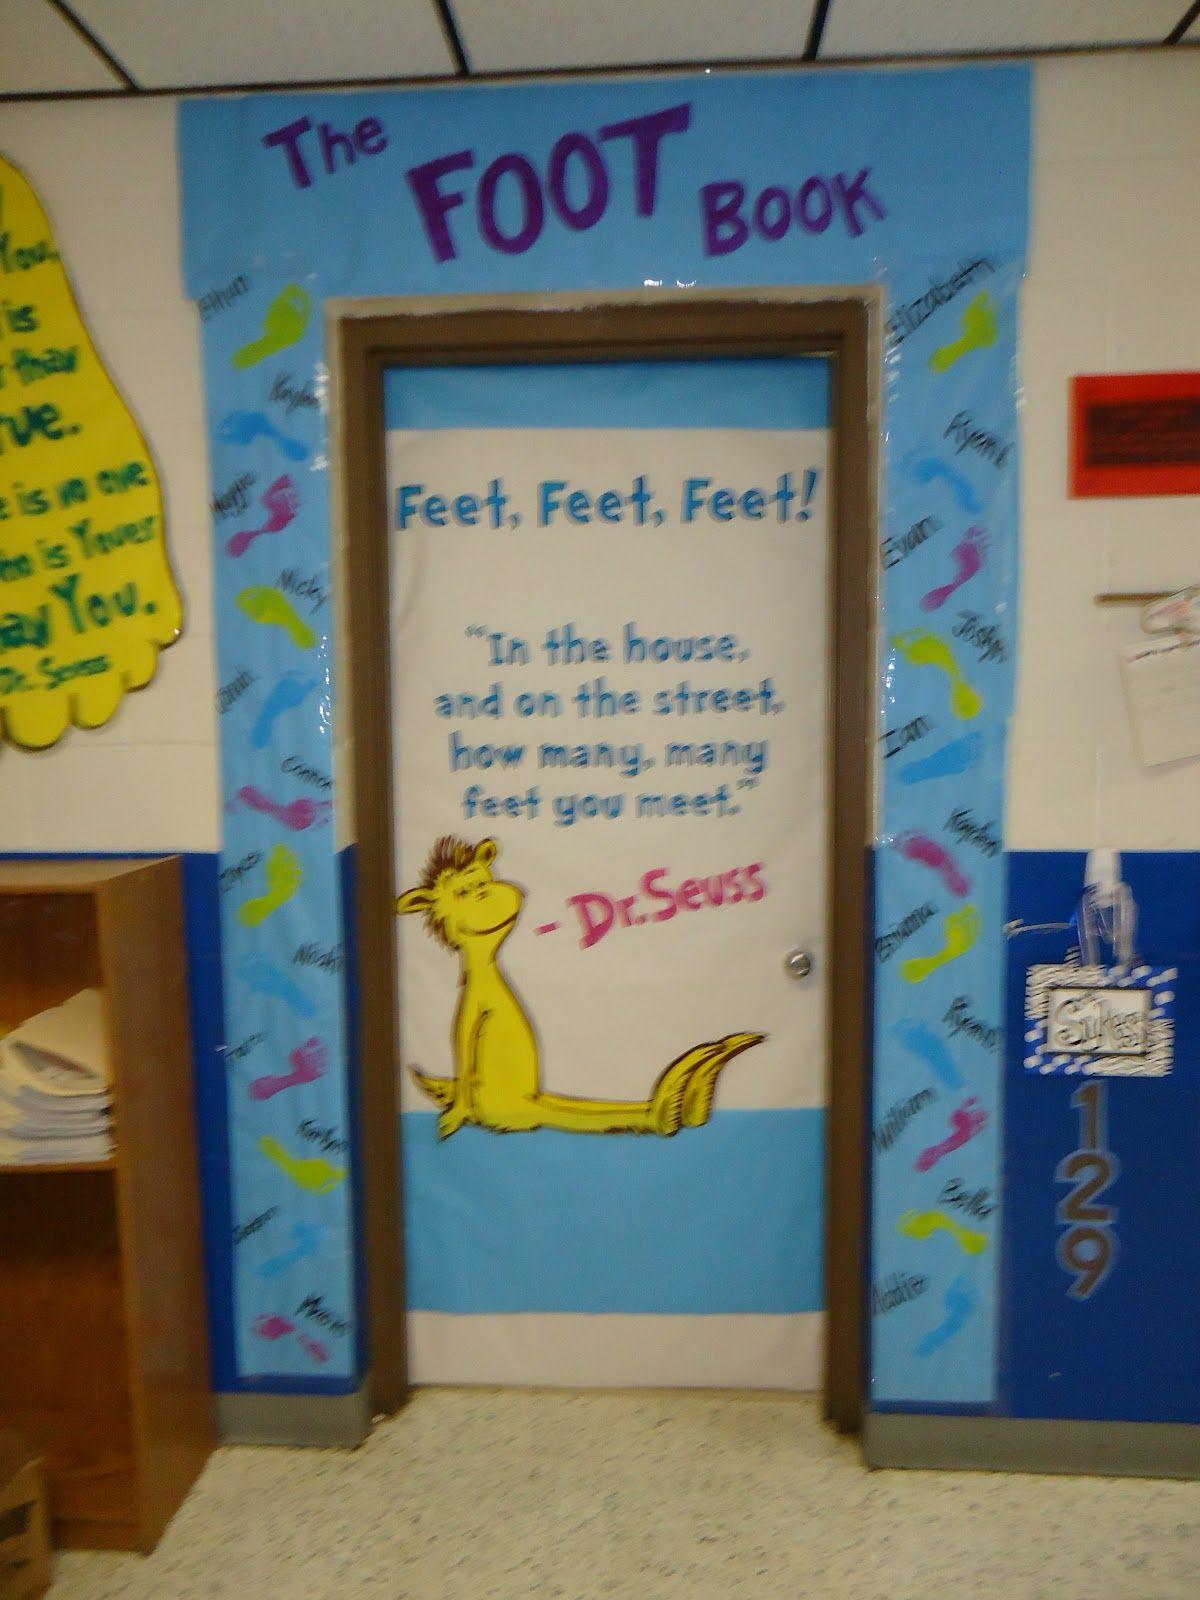 Dr Seuss Door Decorating Contest Ideas | Bookshelf Monstrosity: March 2012  | Dr. Seuss | Pinterest | Doors, Bulletin board and School